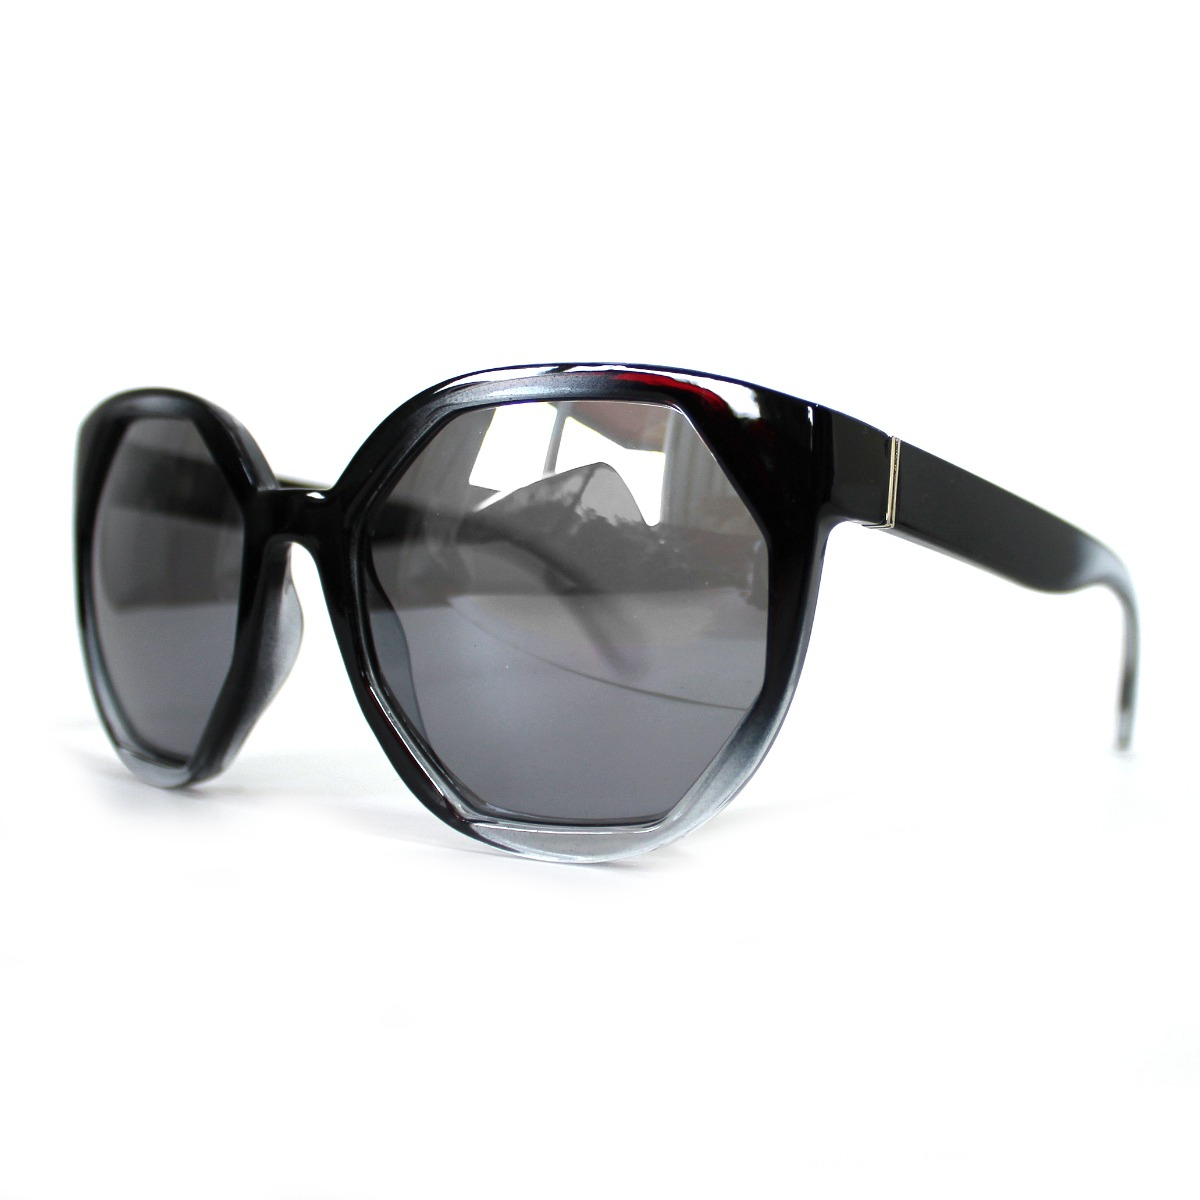 74f30618b óculos de sol feminino geométrico transparente grande preto. Carregando  zoom.